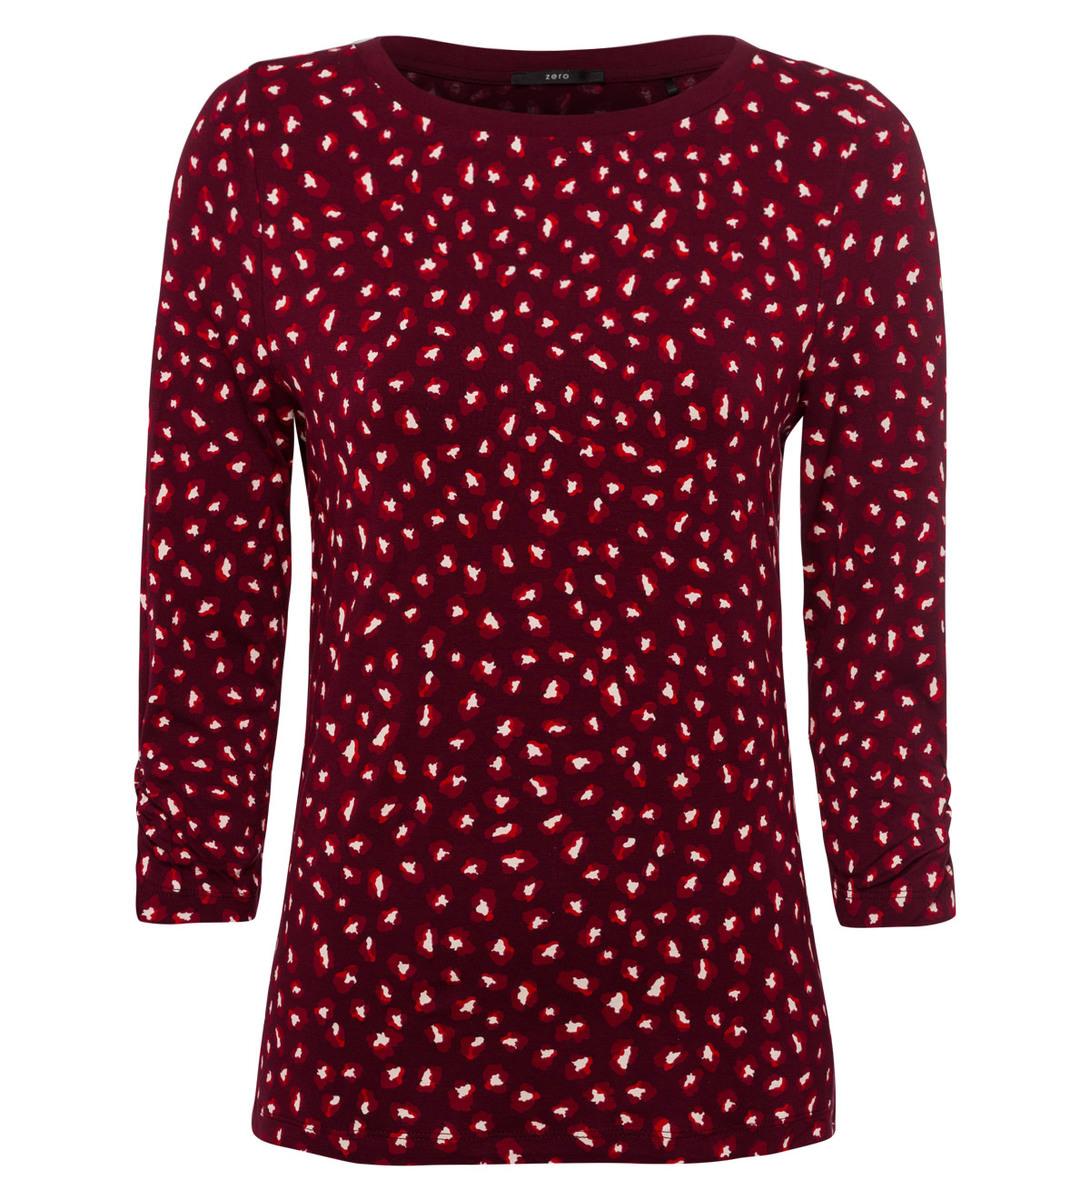 Shirt mit Alloverprint in grape red